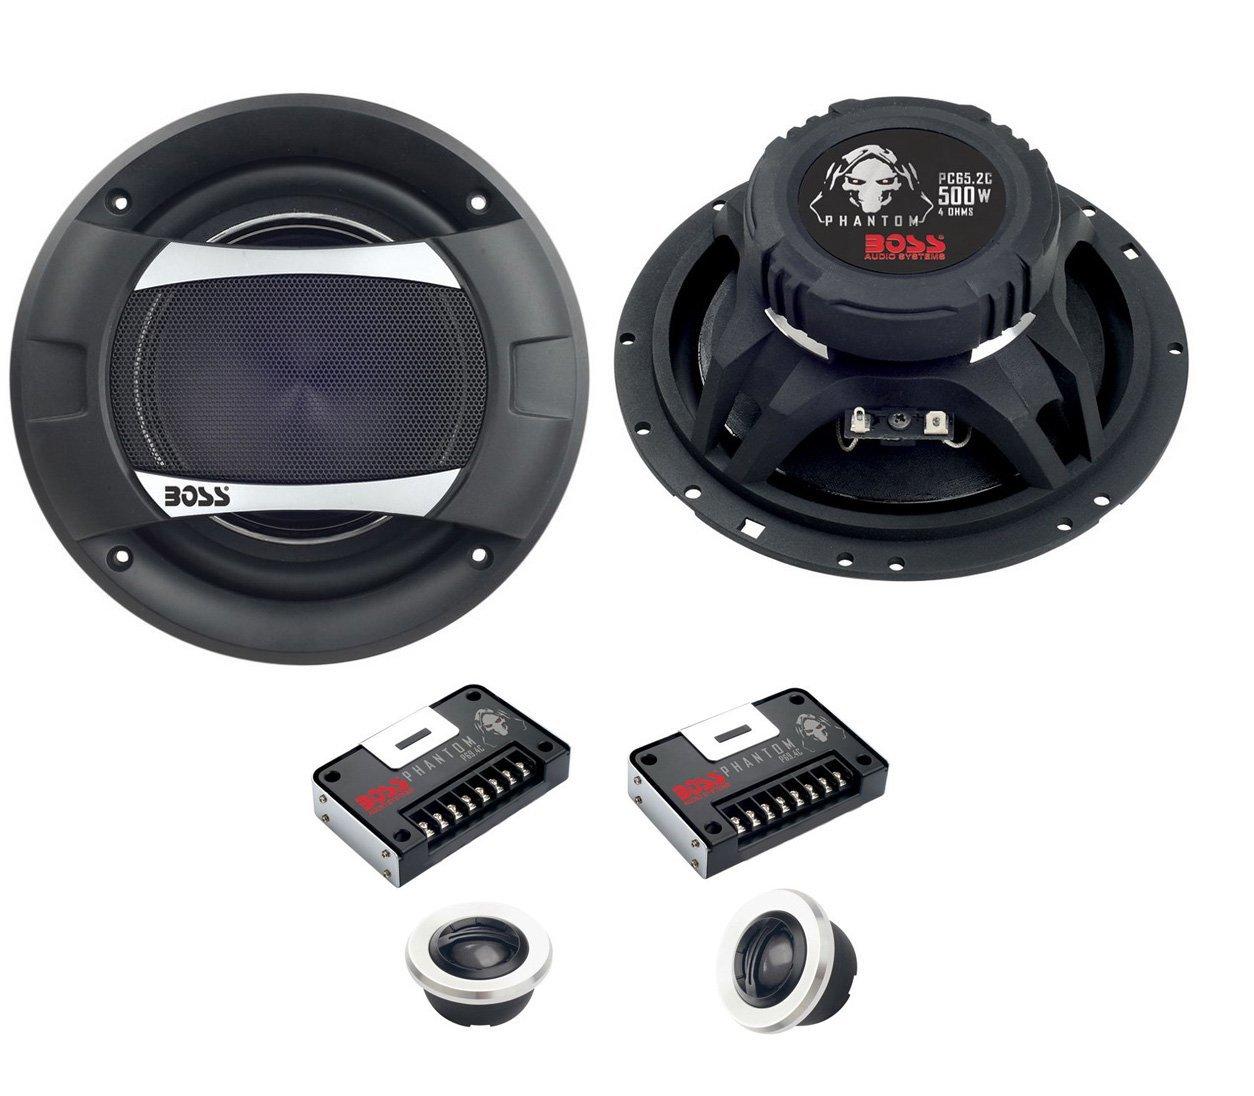 2)New Boss PC65.2C 6.5'' 500W 2-Way + 2) Boss P694C 6x9'' 800W 4-Way Car Speakers